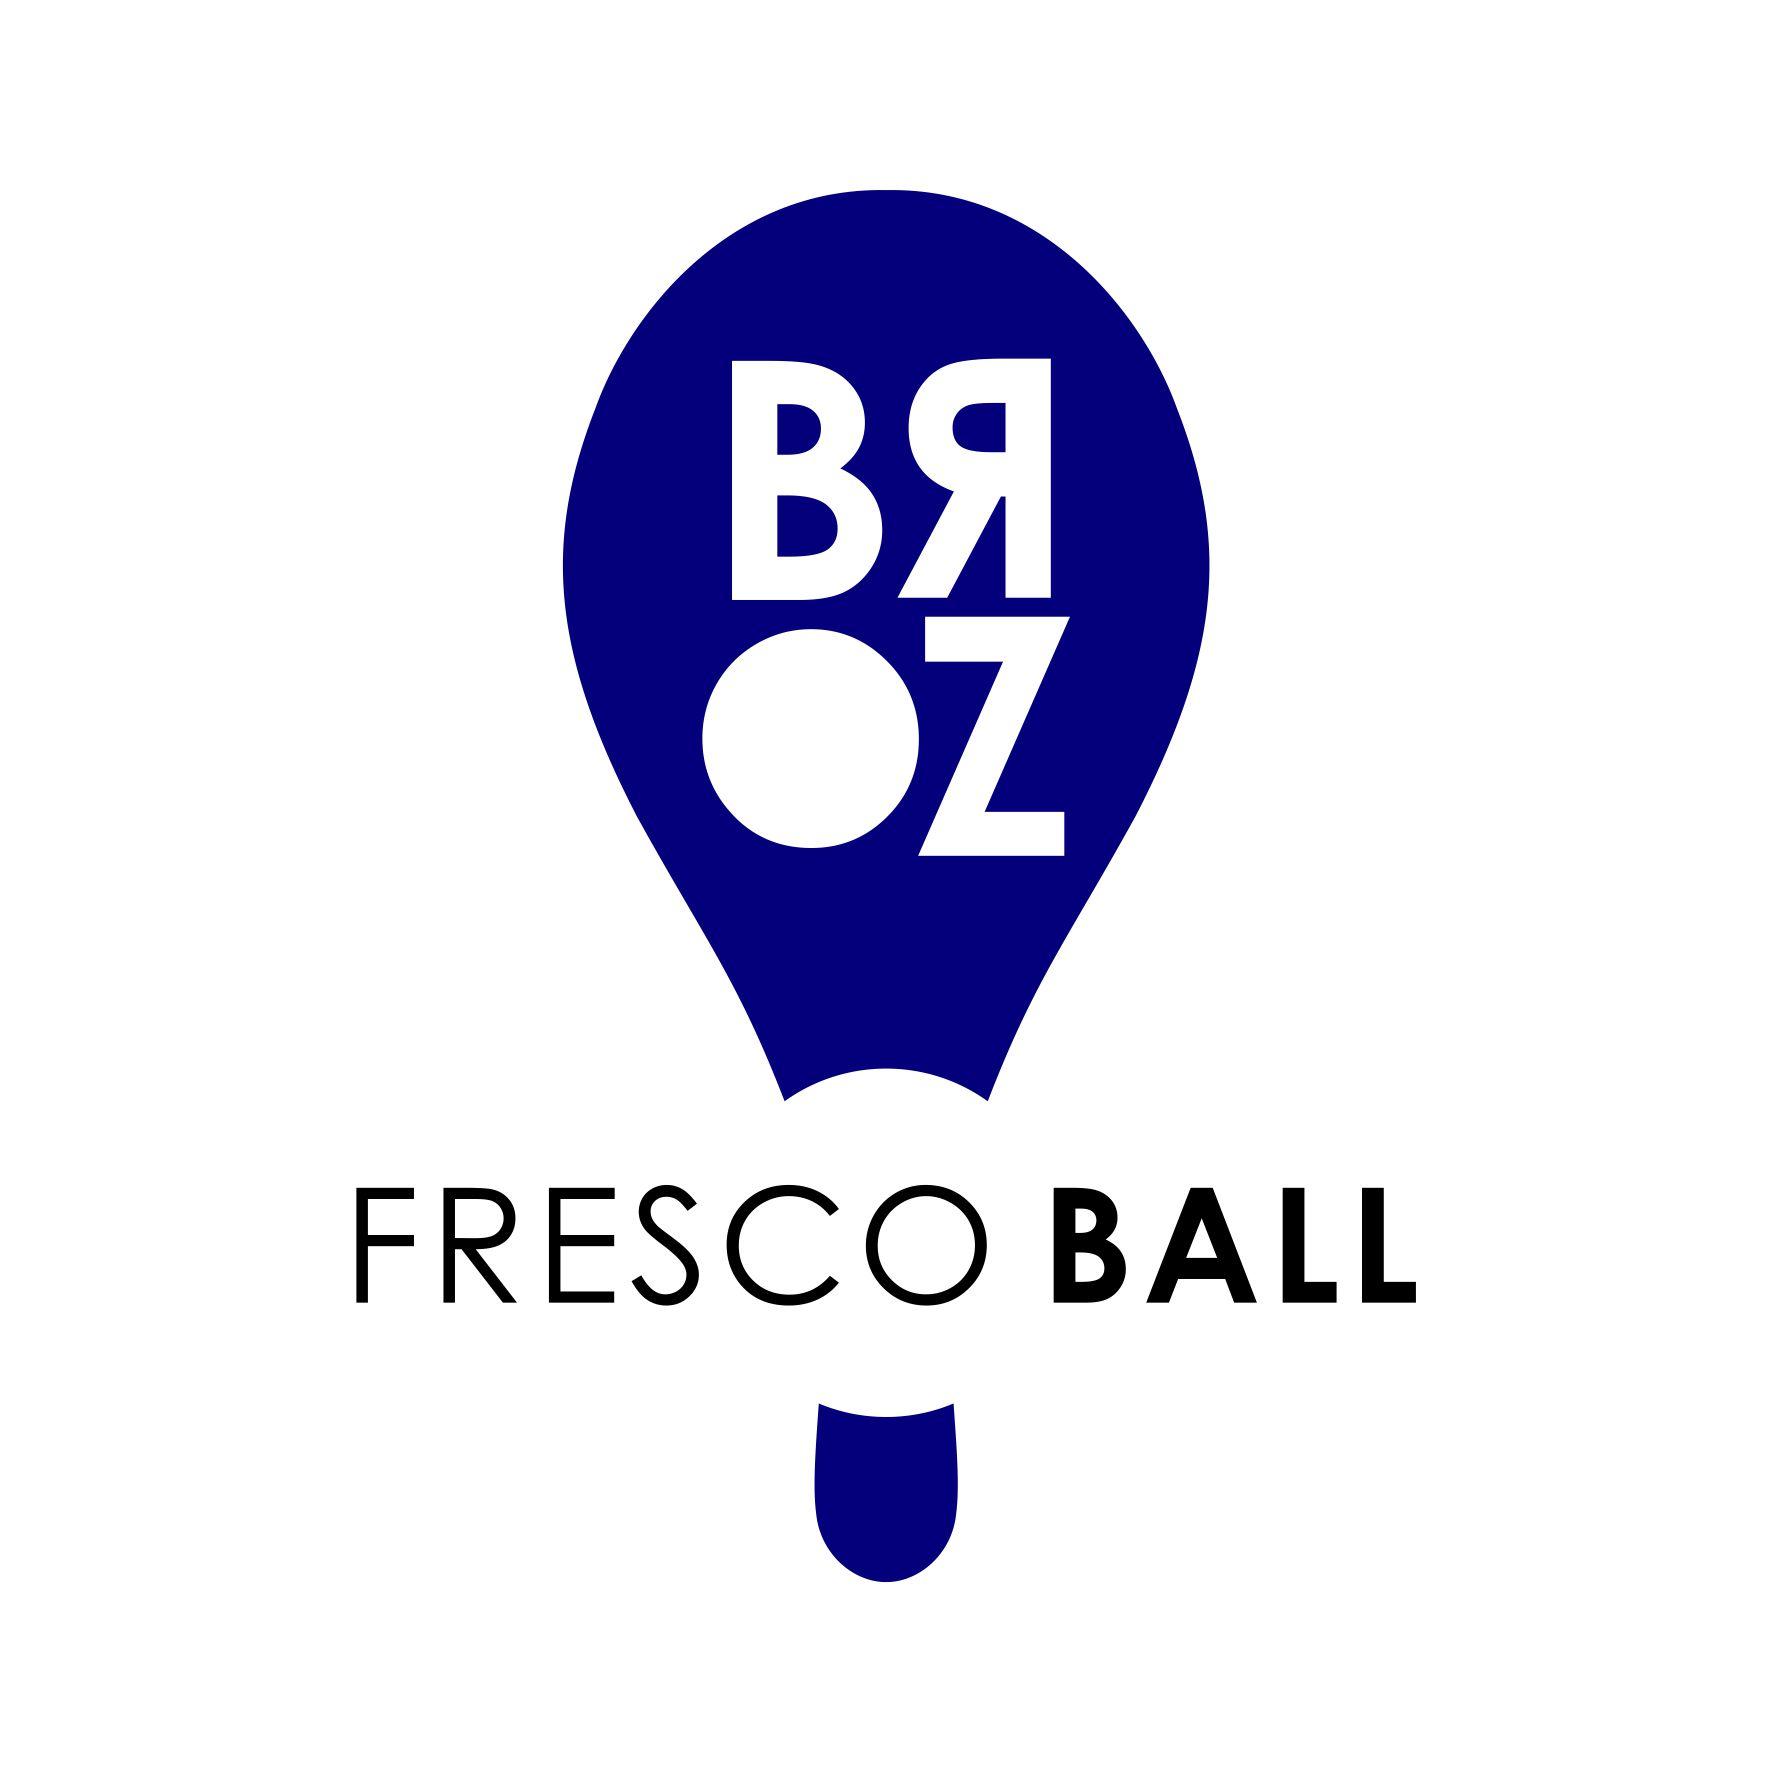 Broz Frescoball